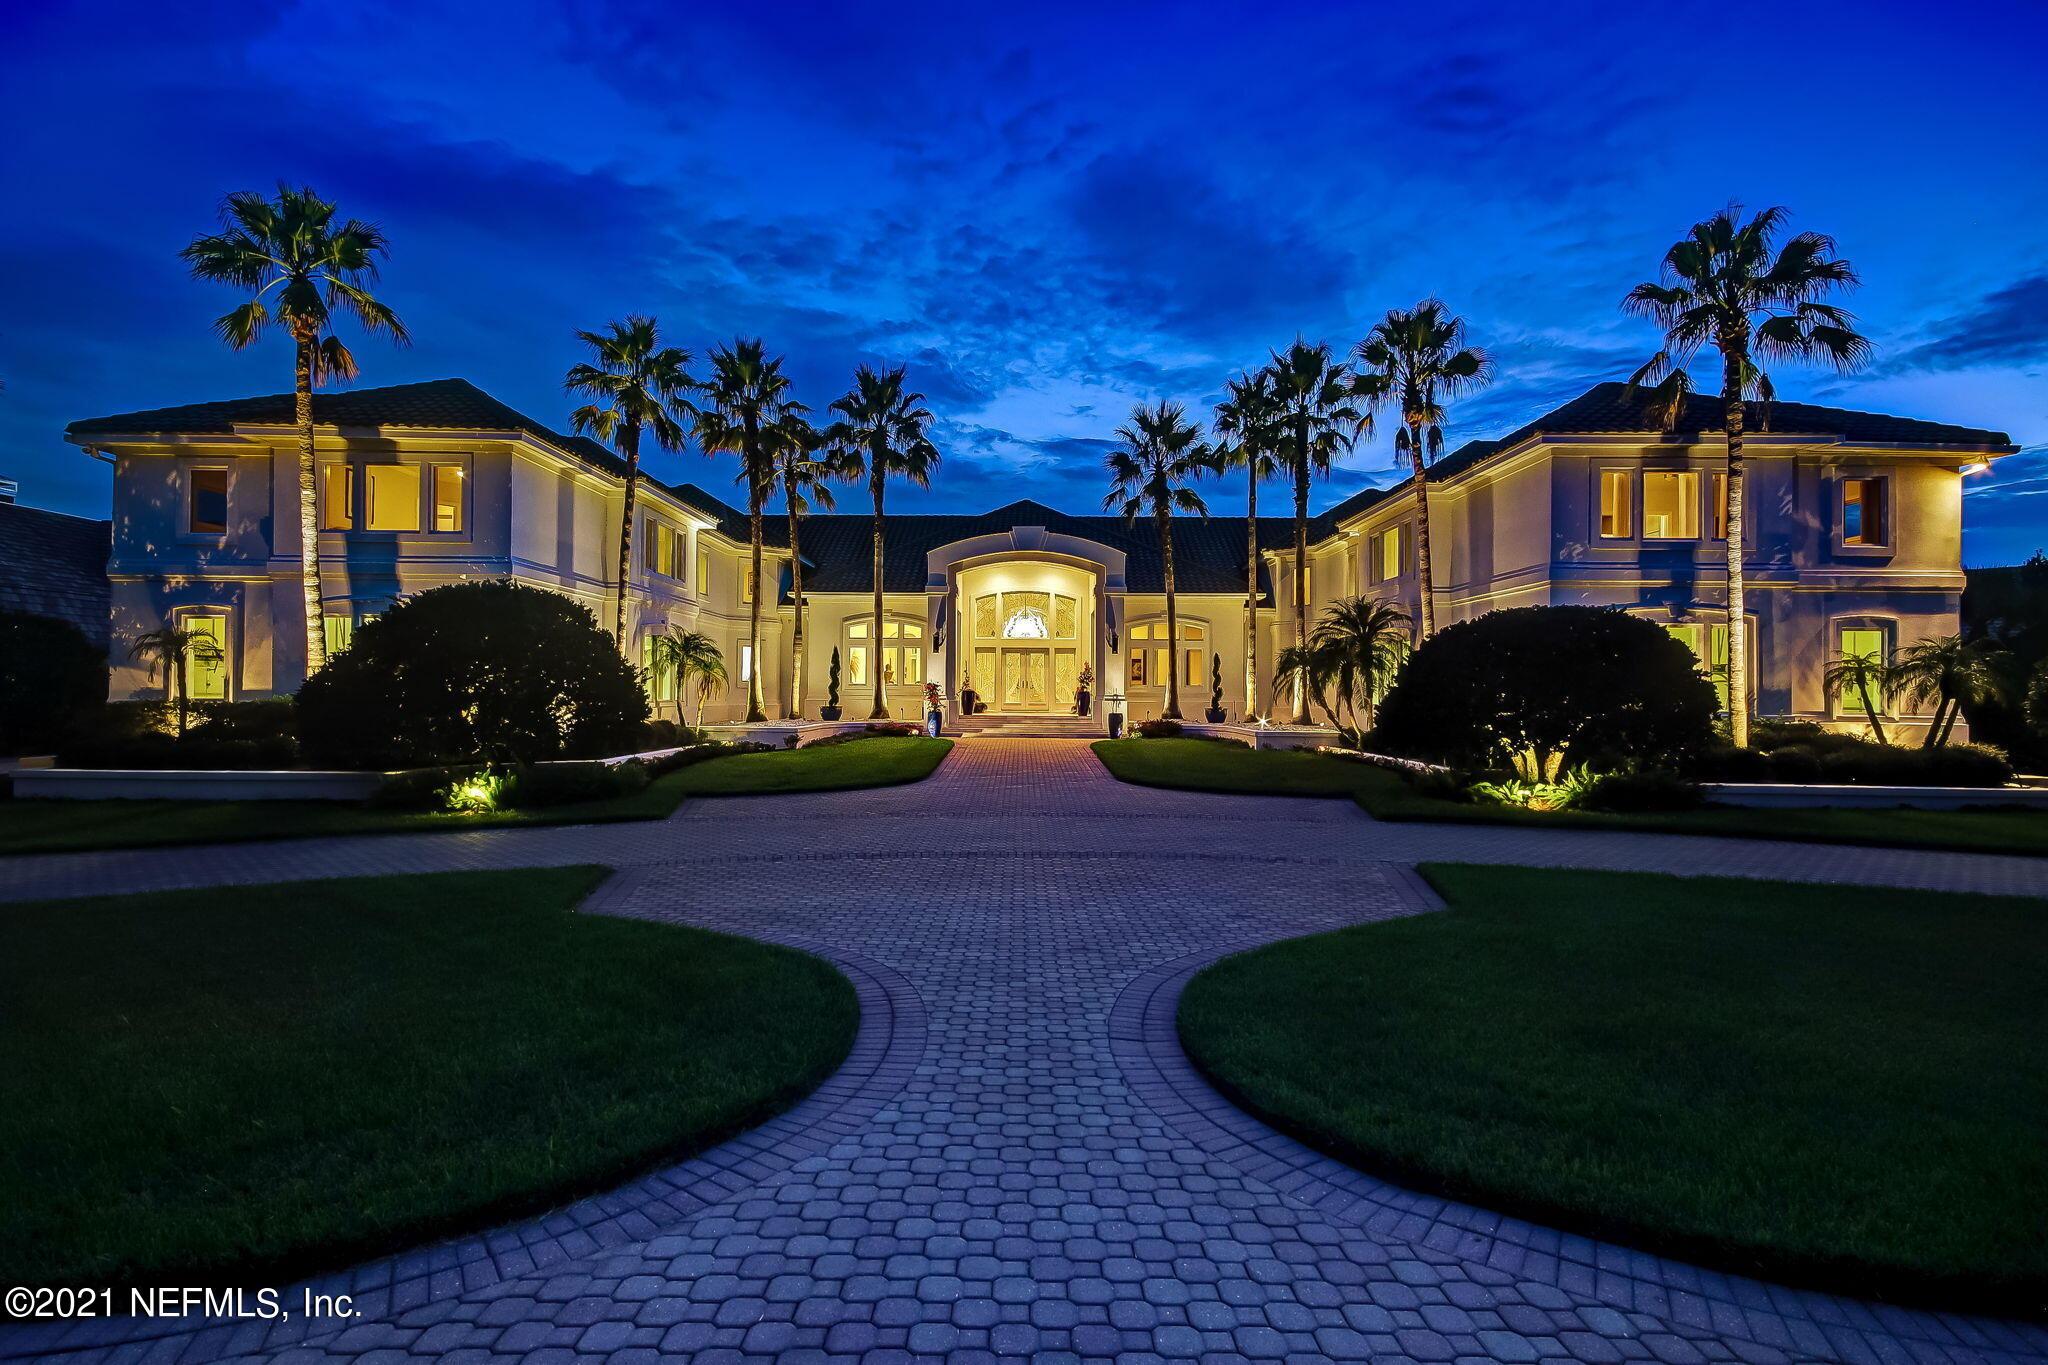 24749 HARBOUR VIEW, PONTE VEDRA BEACH, FLORIDA 32082, 9 Bedrooms Bedrooms, ,9 BathroomsBathrooms,Residential,For sale,HARBOUR VIEW,1129220